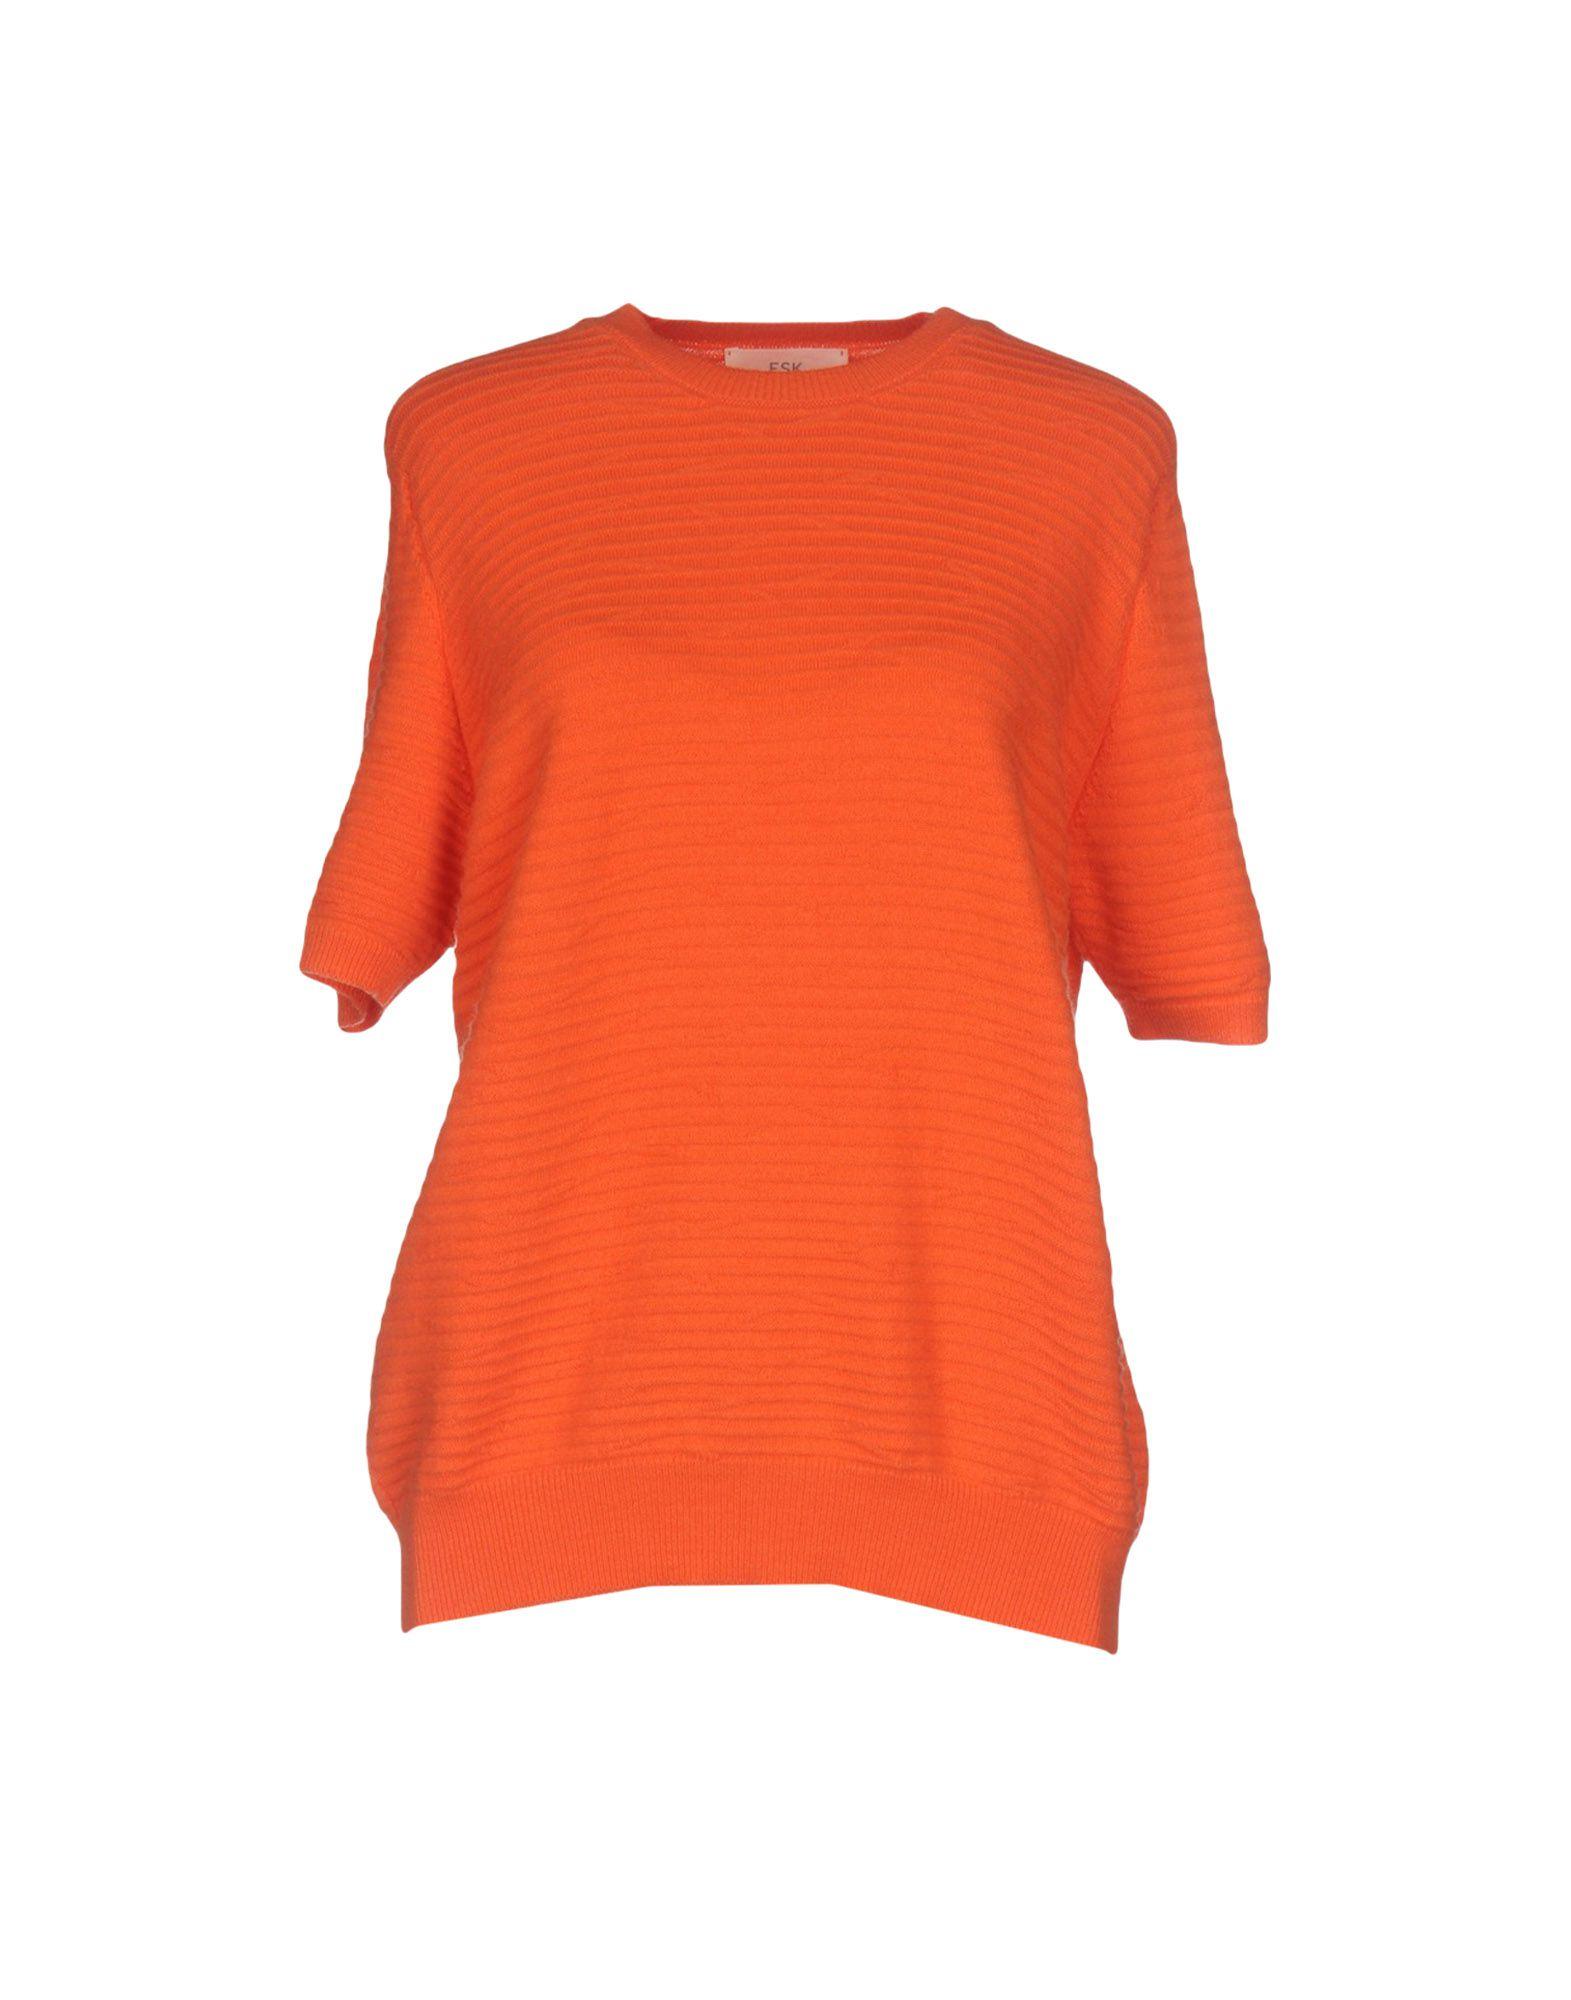 ESK Cashmere Blend in Orange